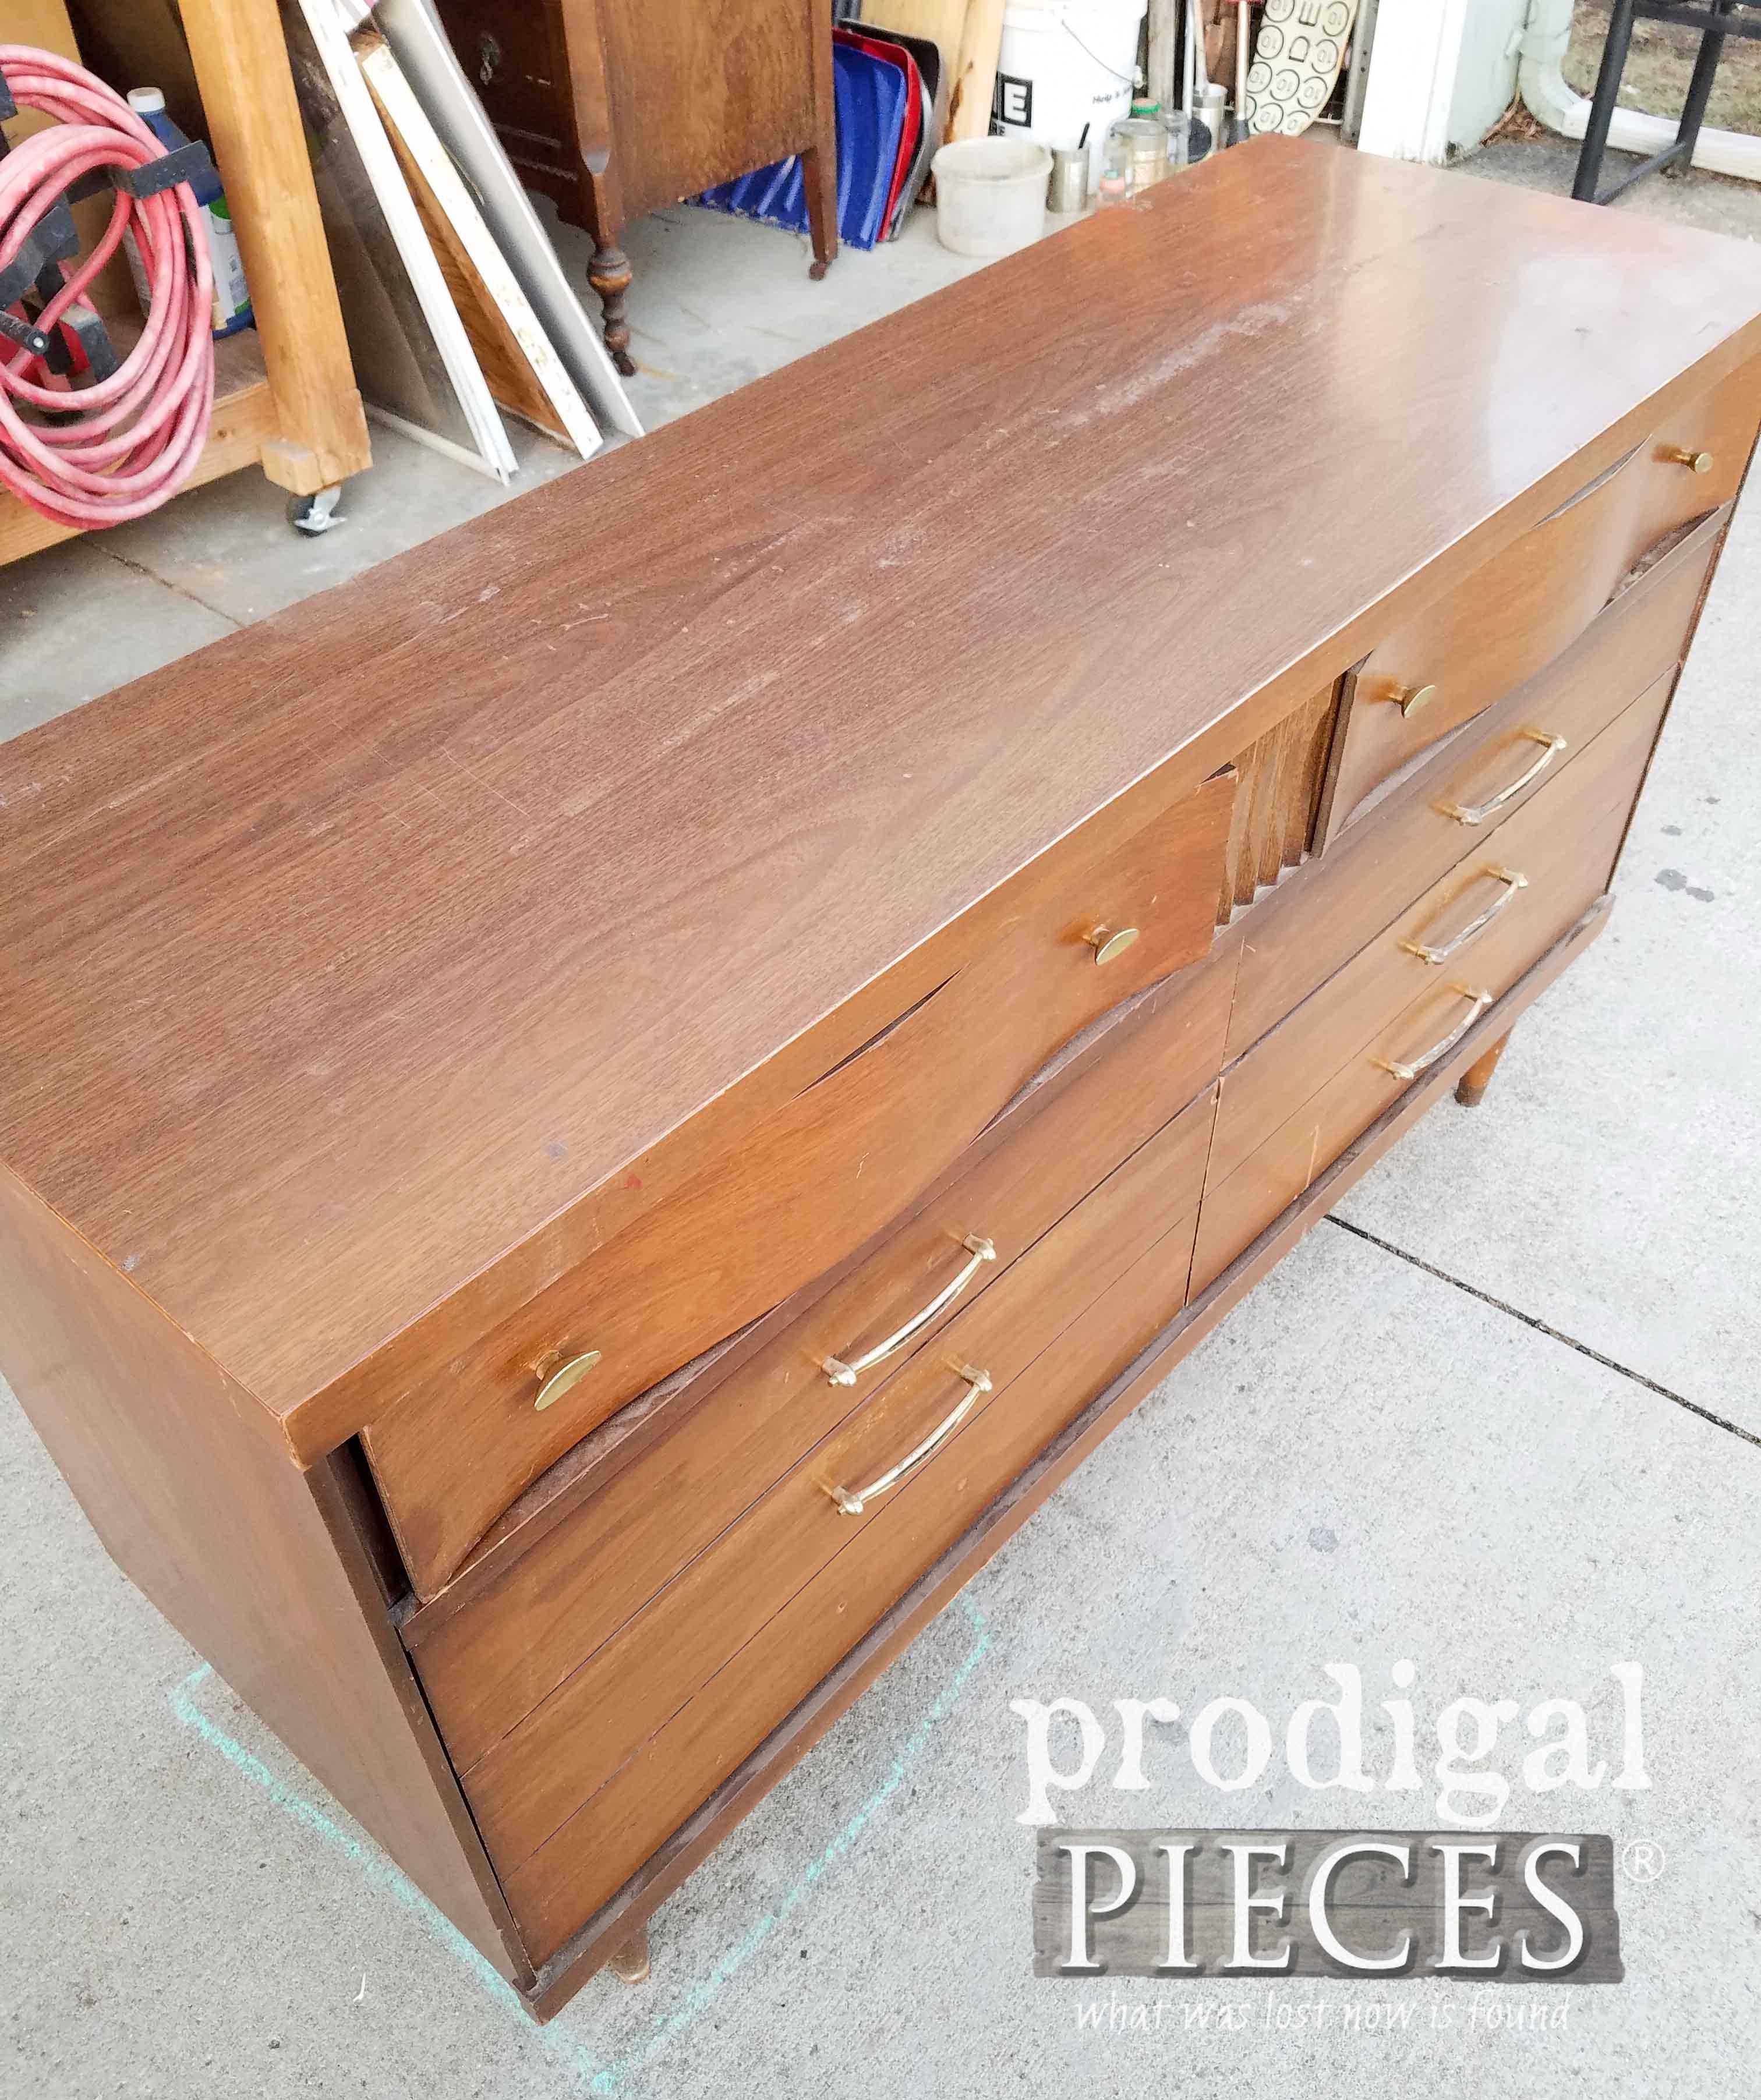 Top of Mid Century Modern Dresser | prodigalpieces.com